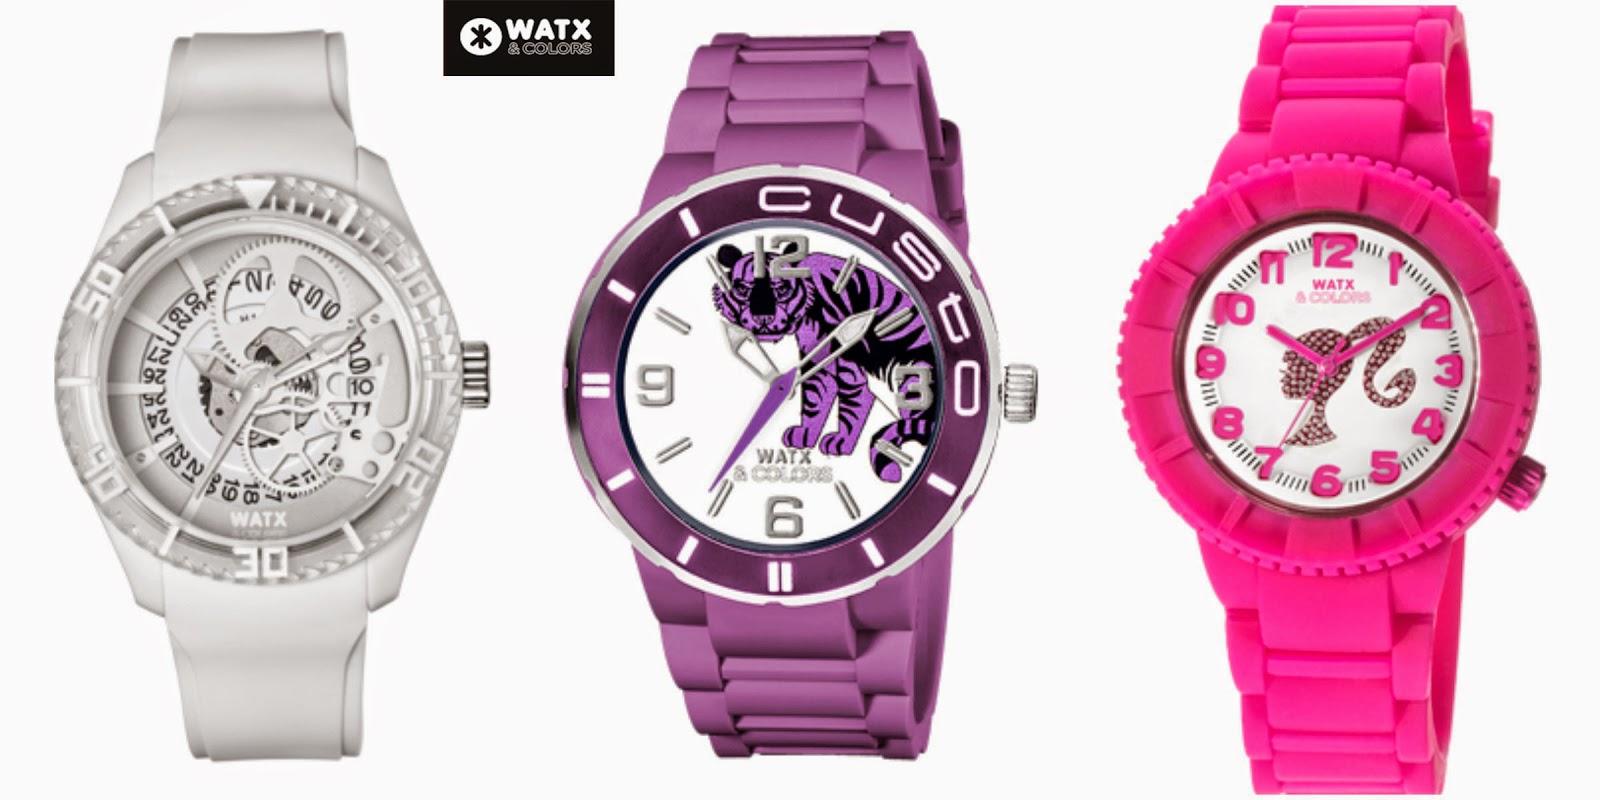 Relojes Watx Thader